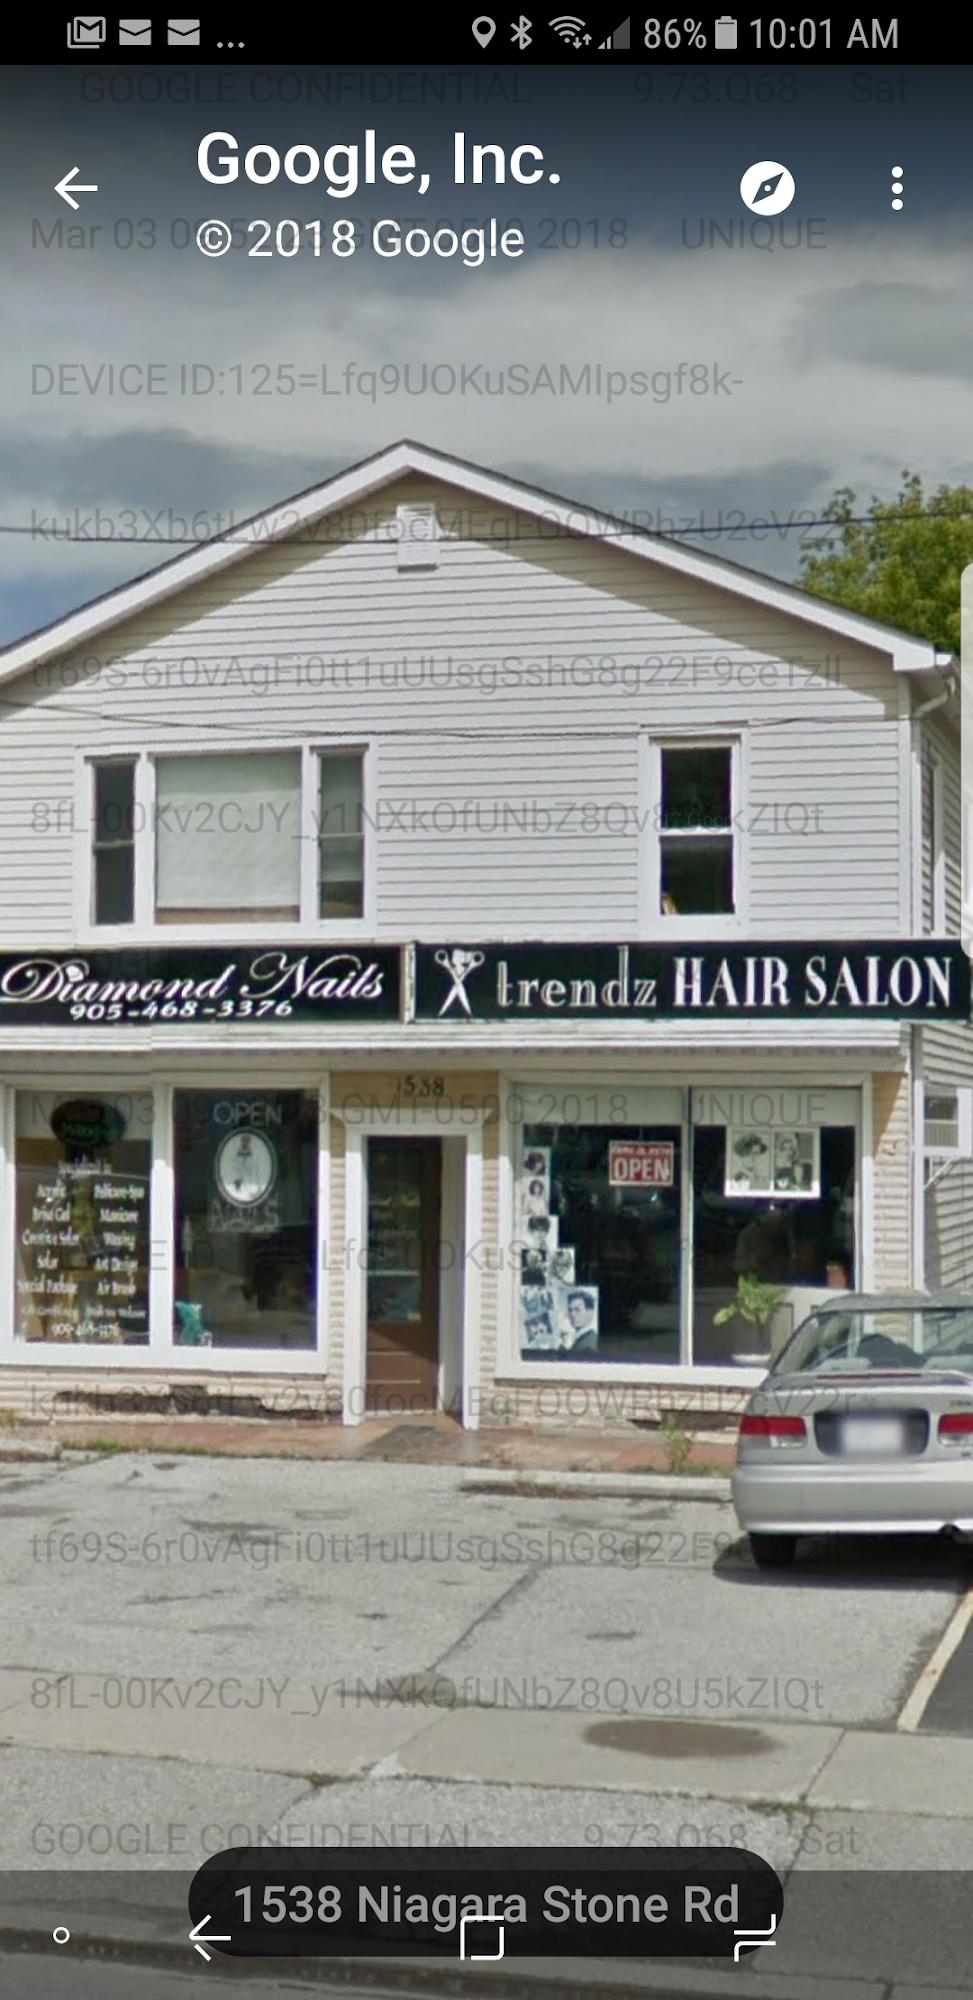 Trendz Hair Salon 1550 Niagara Stone Rd, Niagara-on-the-Lake